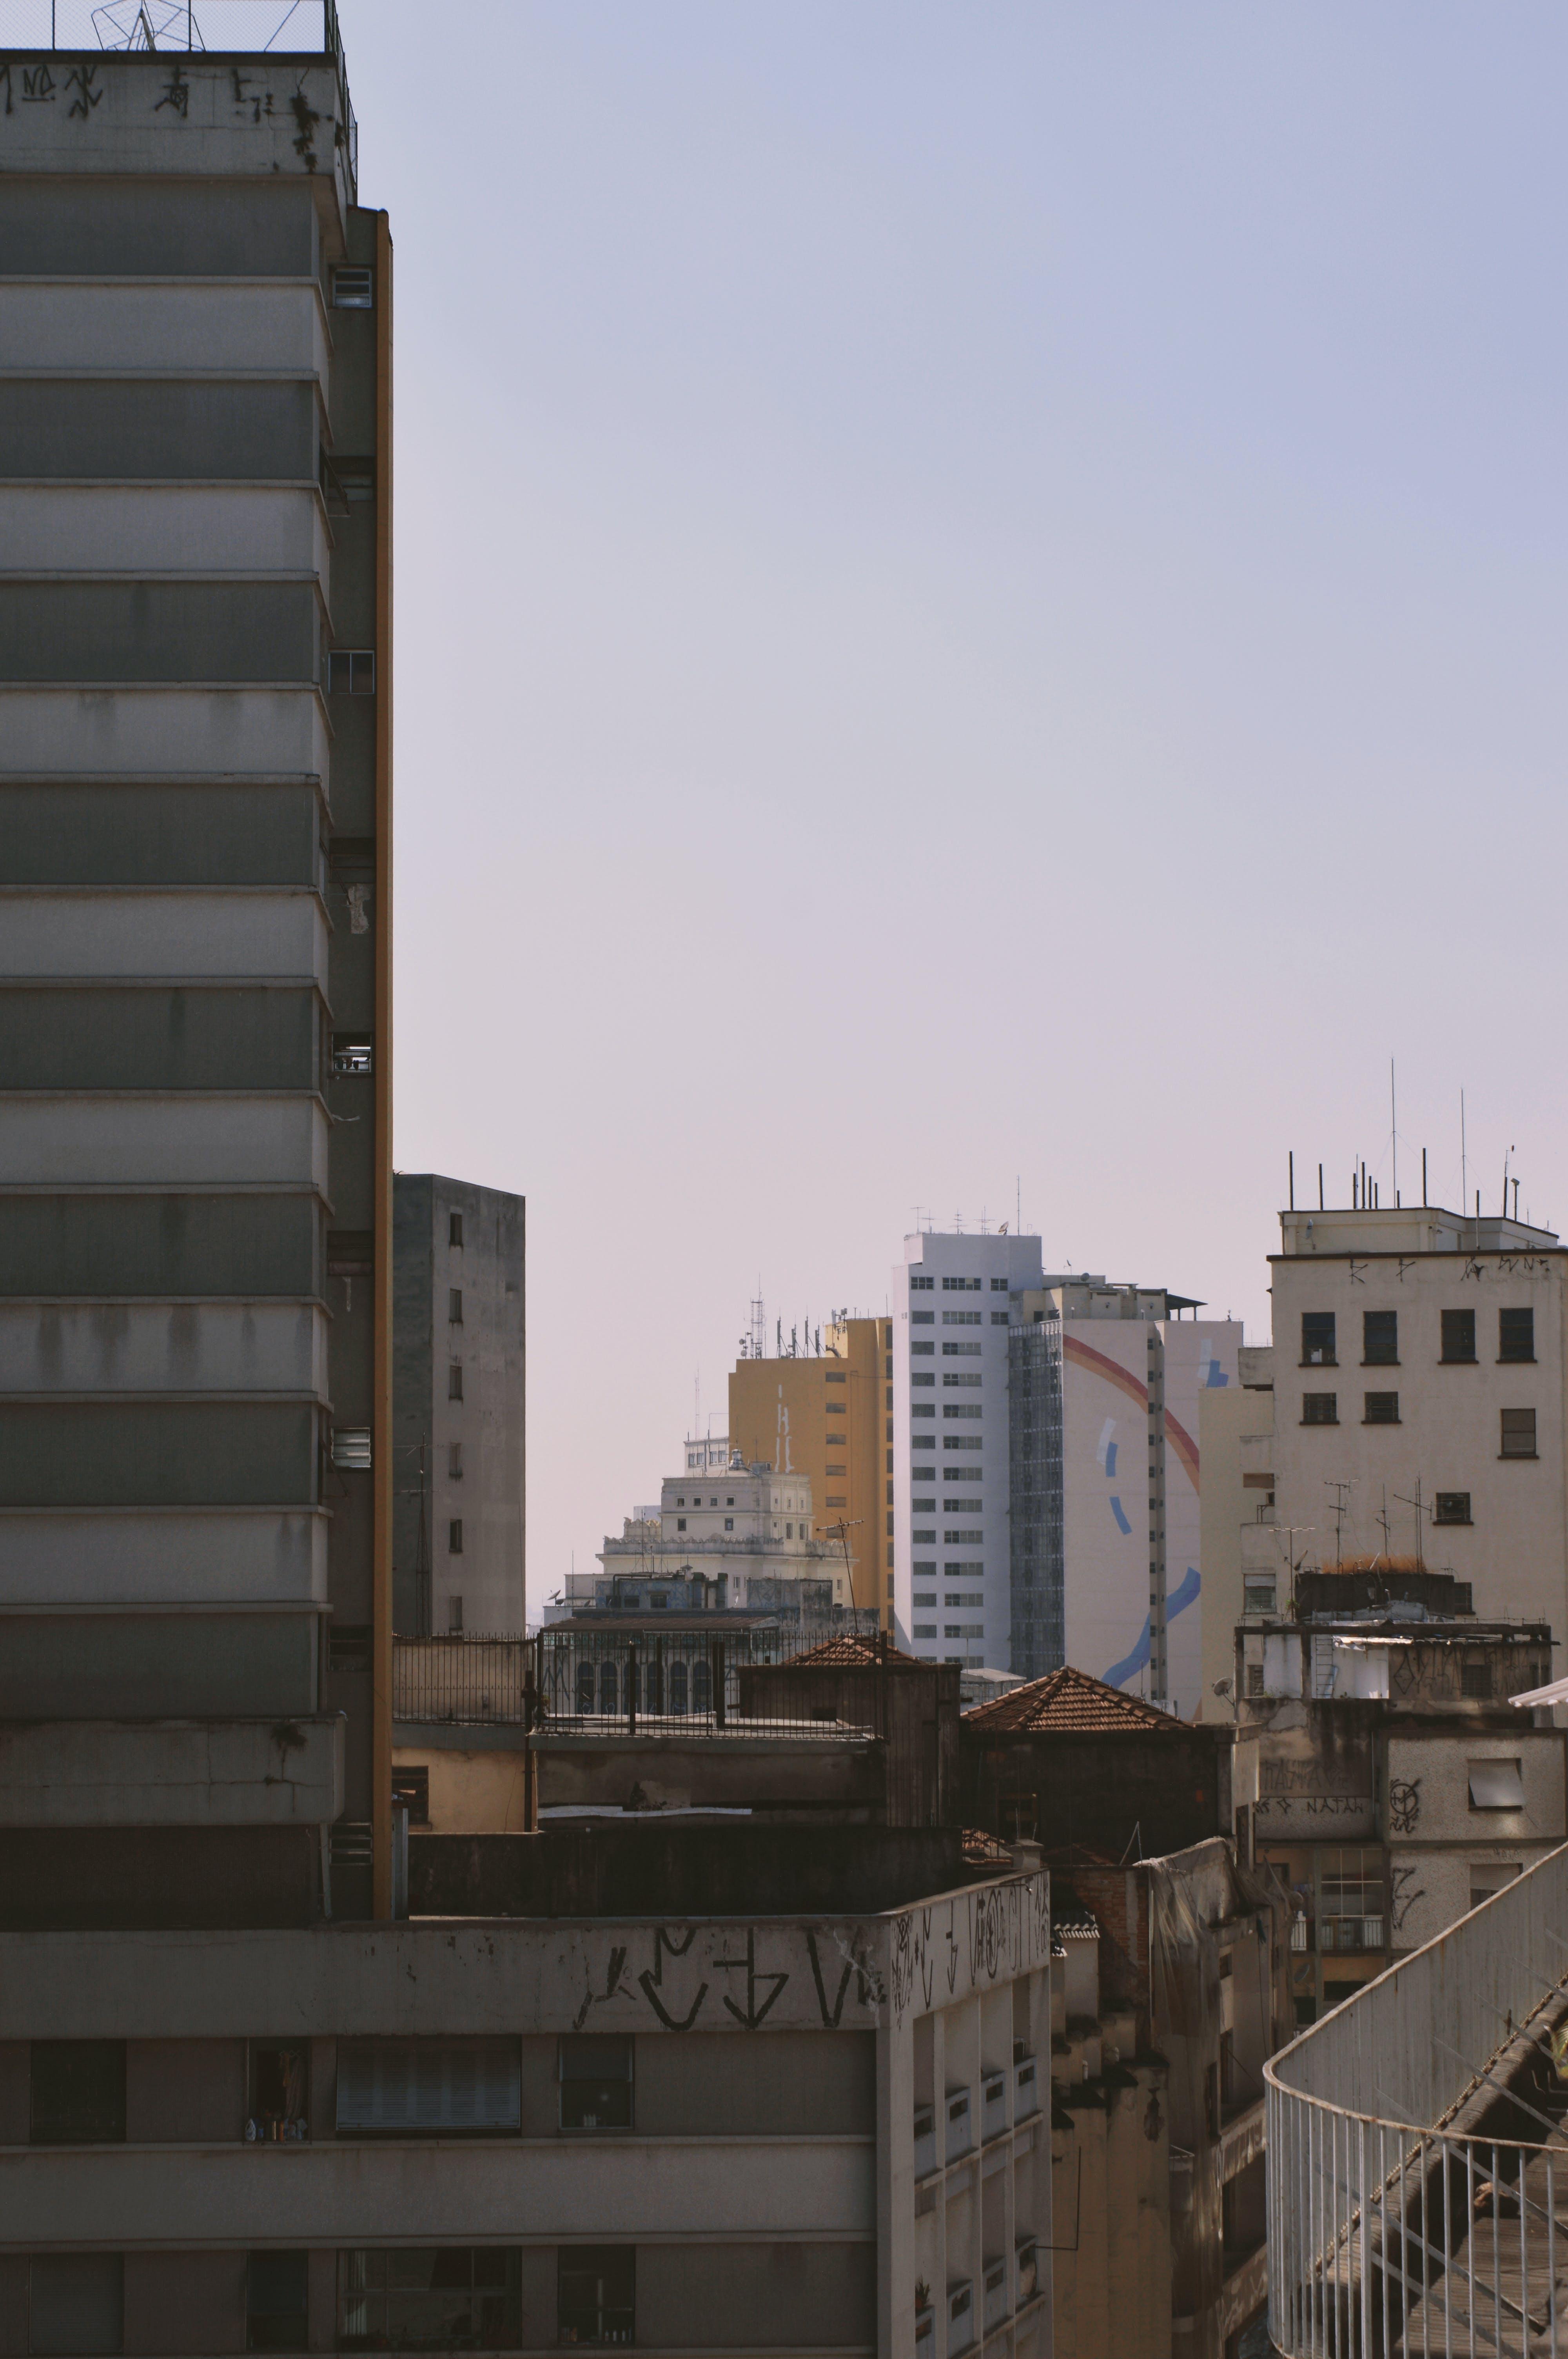 Kostenloses Stock Foto zu apartmentgebäude, gebäude, himmel, lila himmel